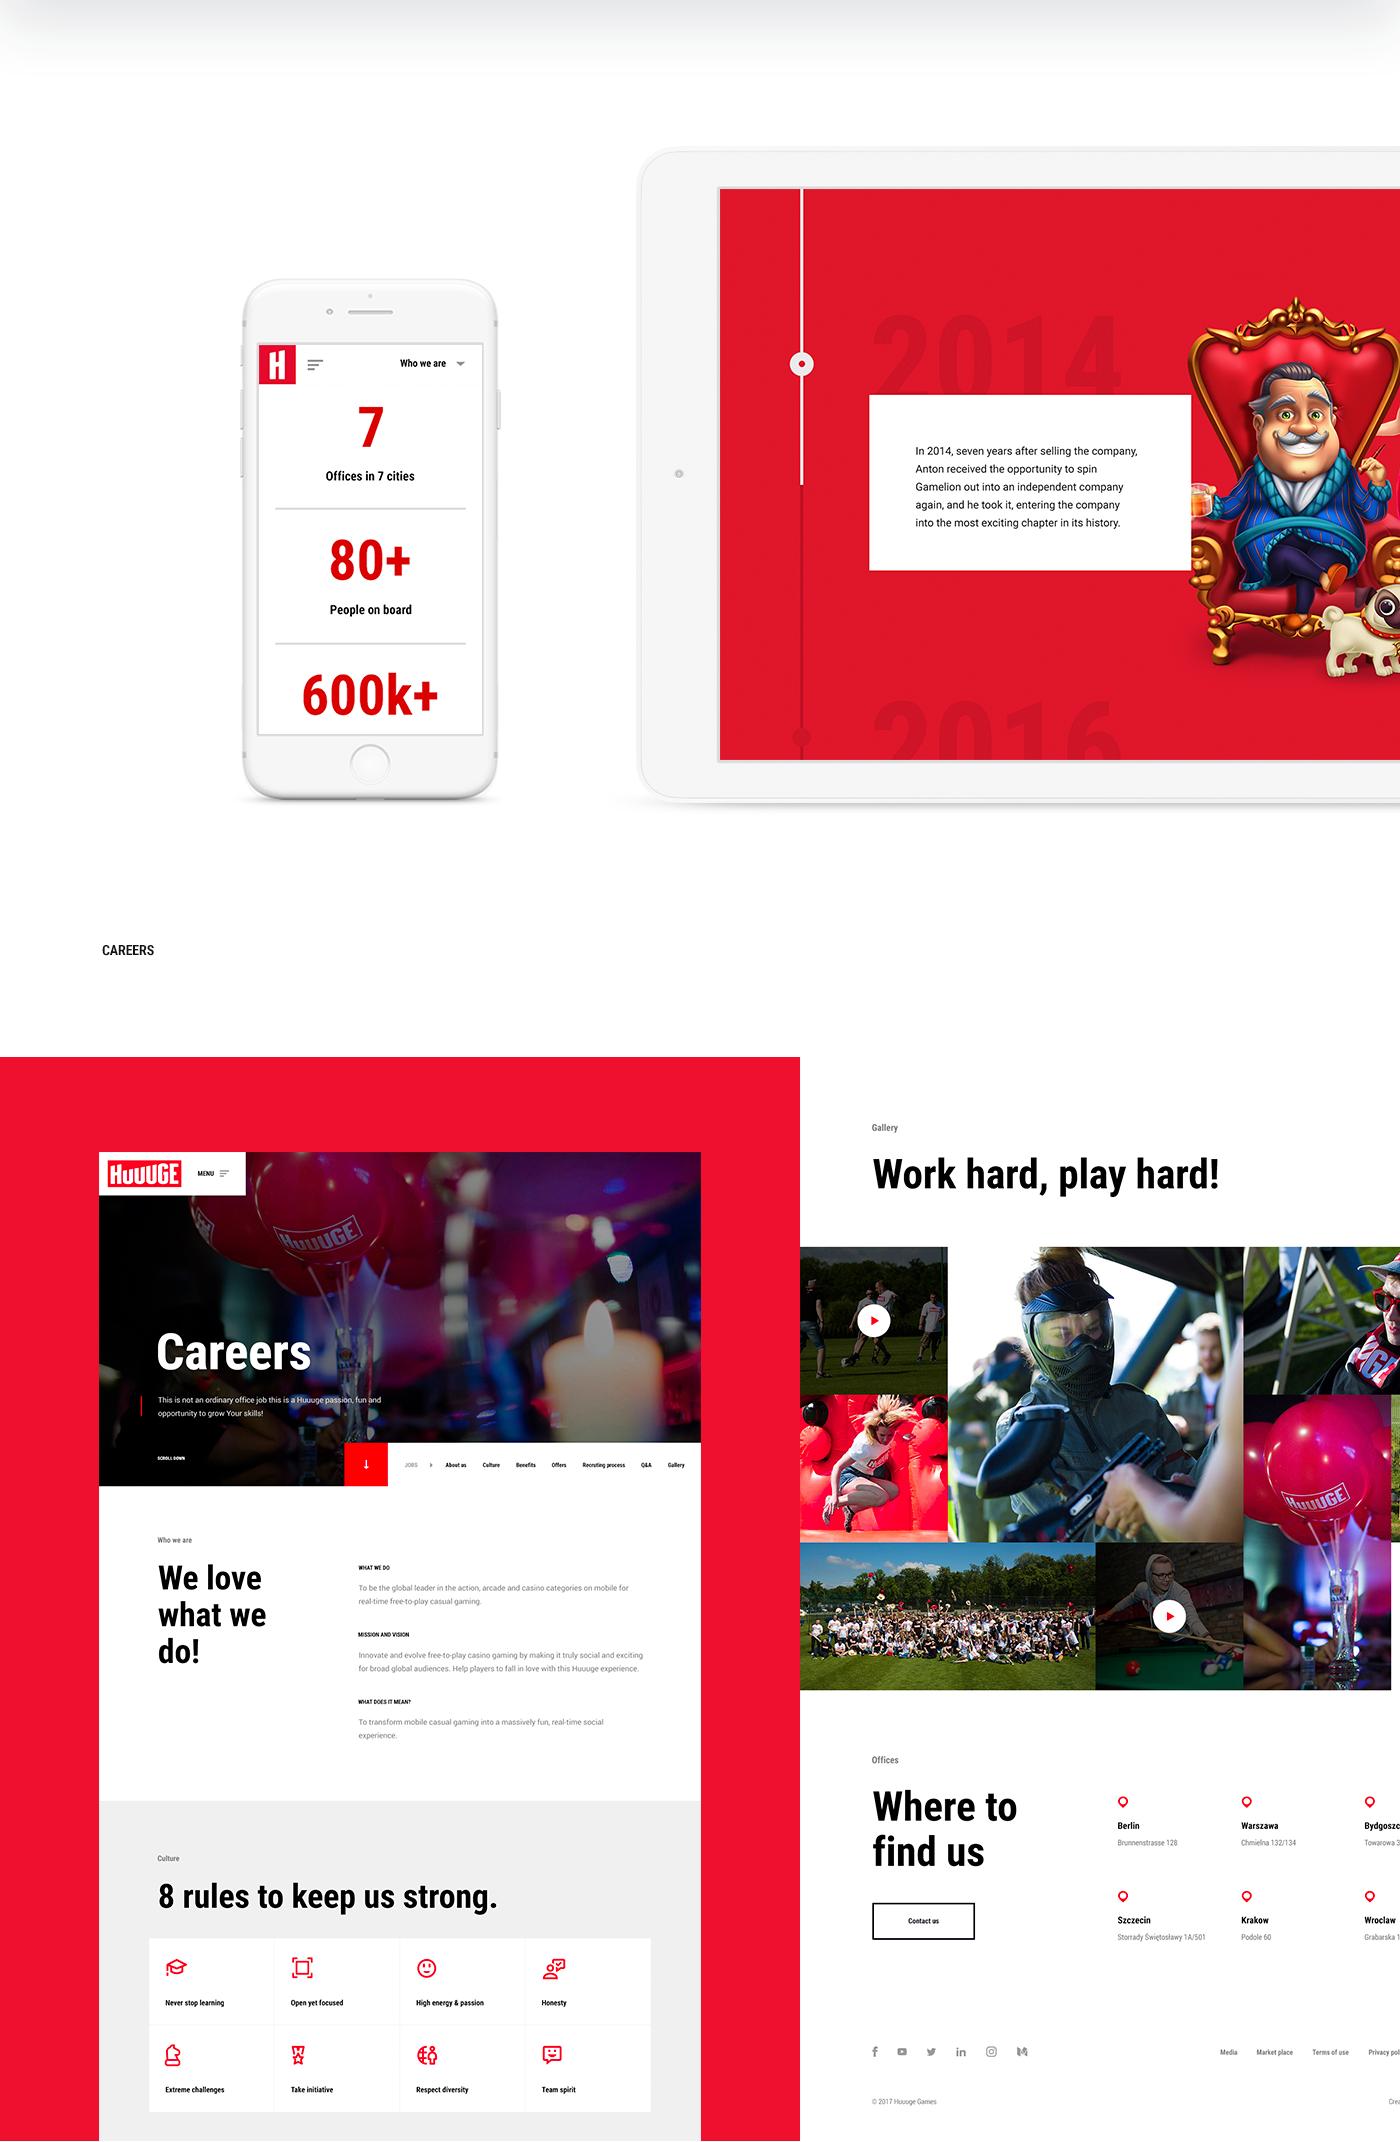 huuuge Games mobile games mobile game challenge dobies socha branding  Webdesign